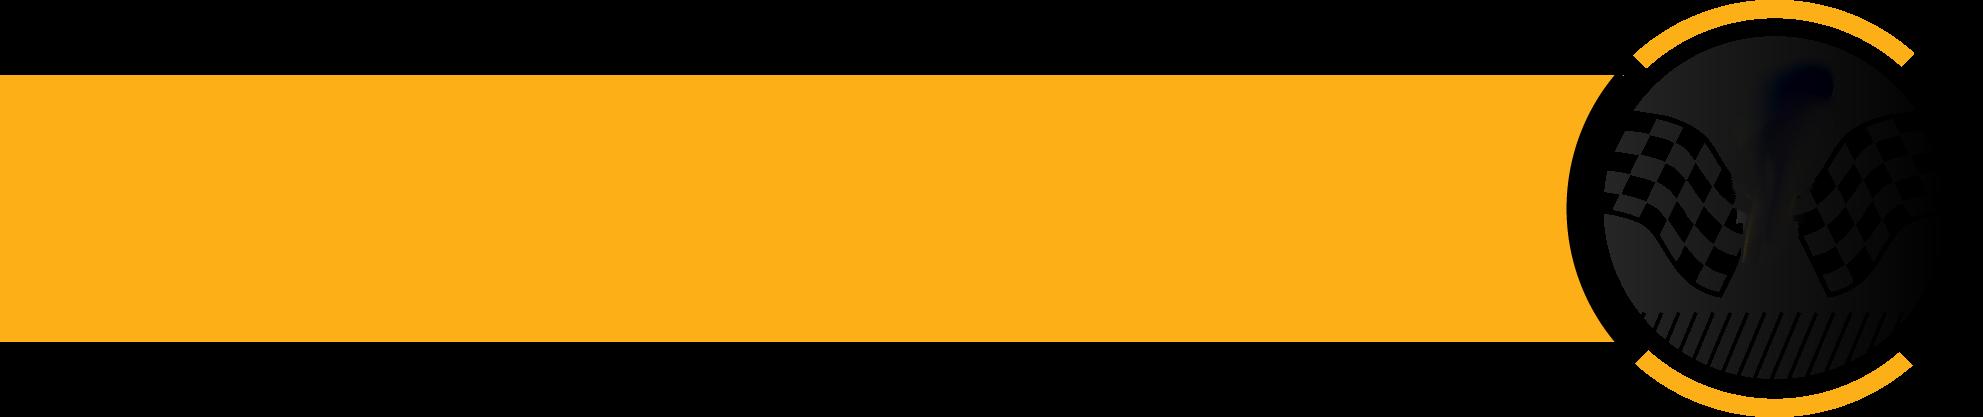 Маркетинговое агентство B2B-Creative